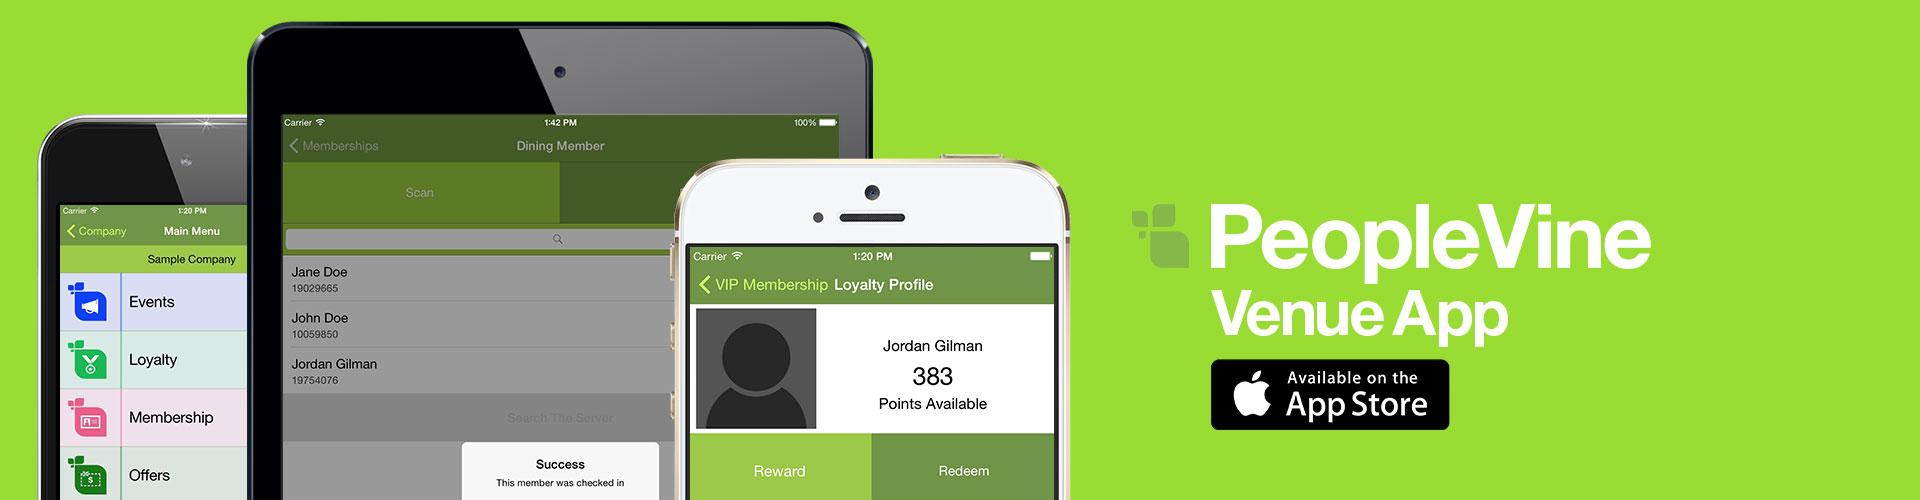 Download the PeopleVine Venue App